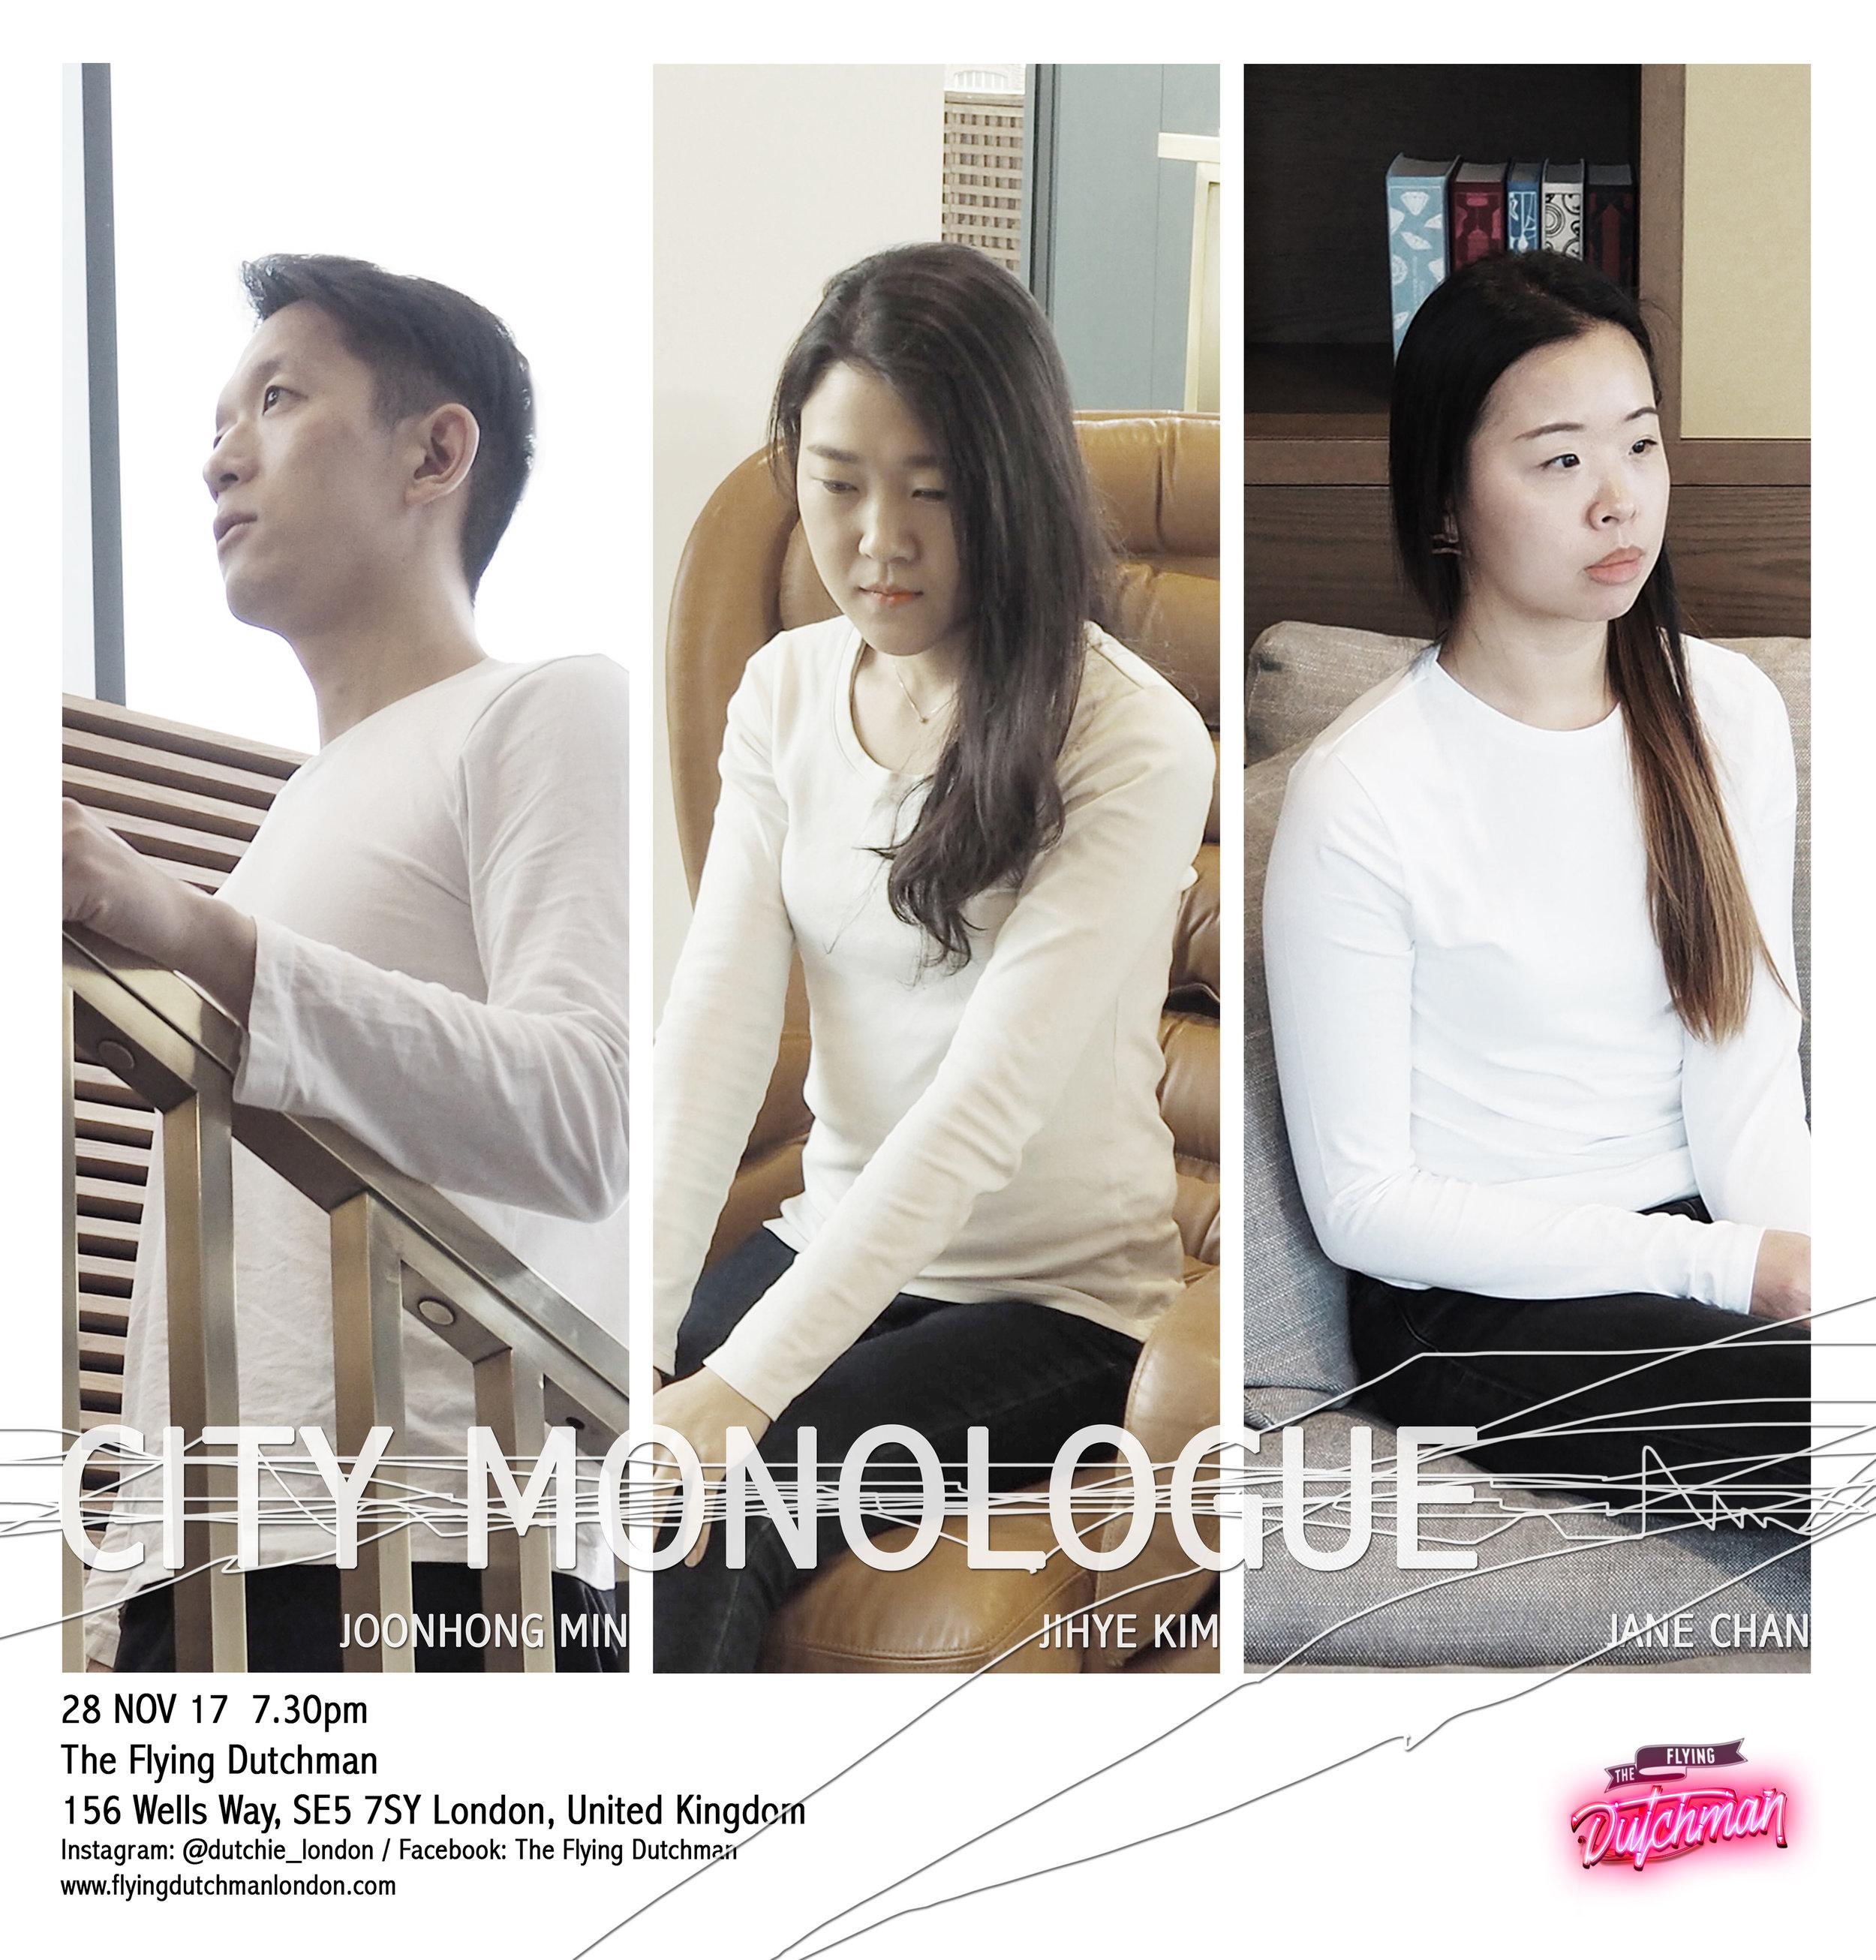 City Monologue.jpg